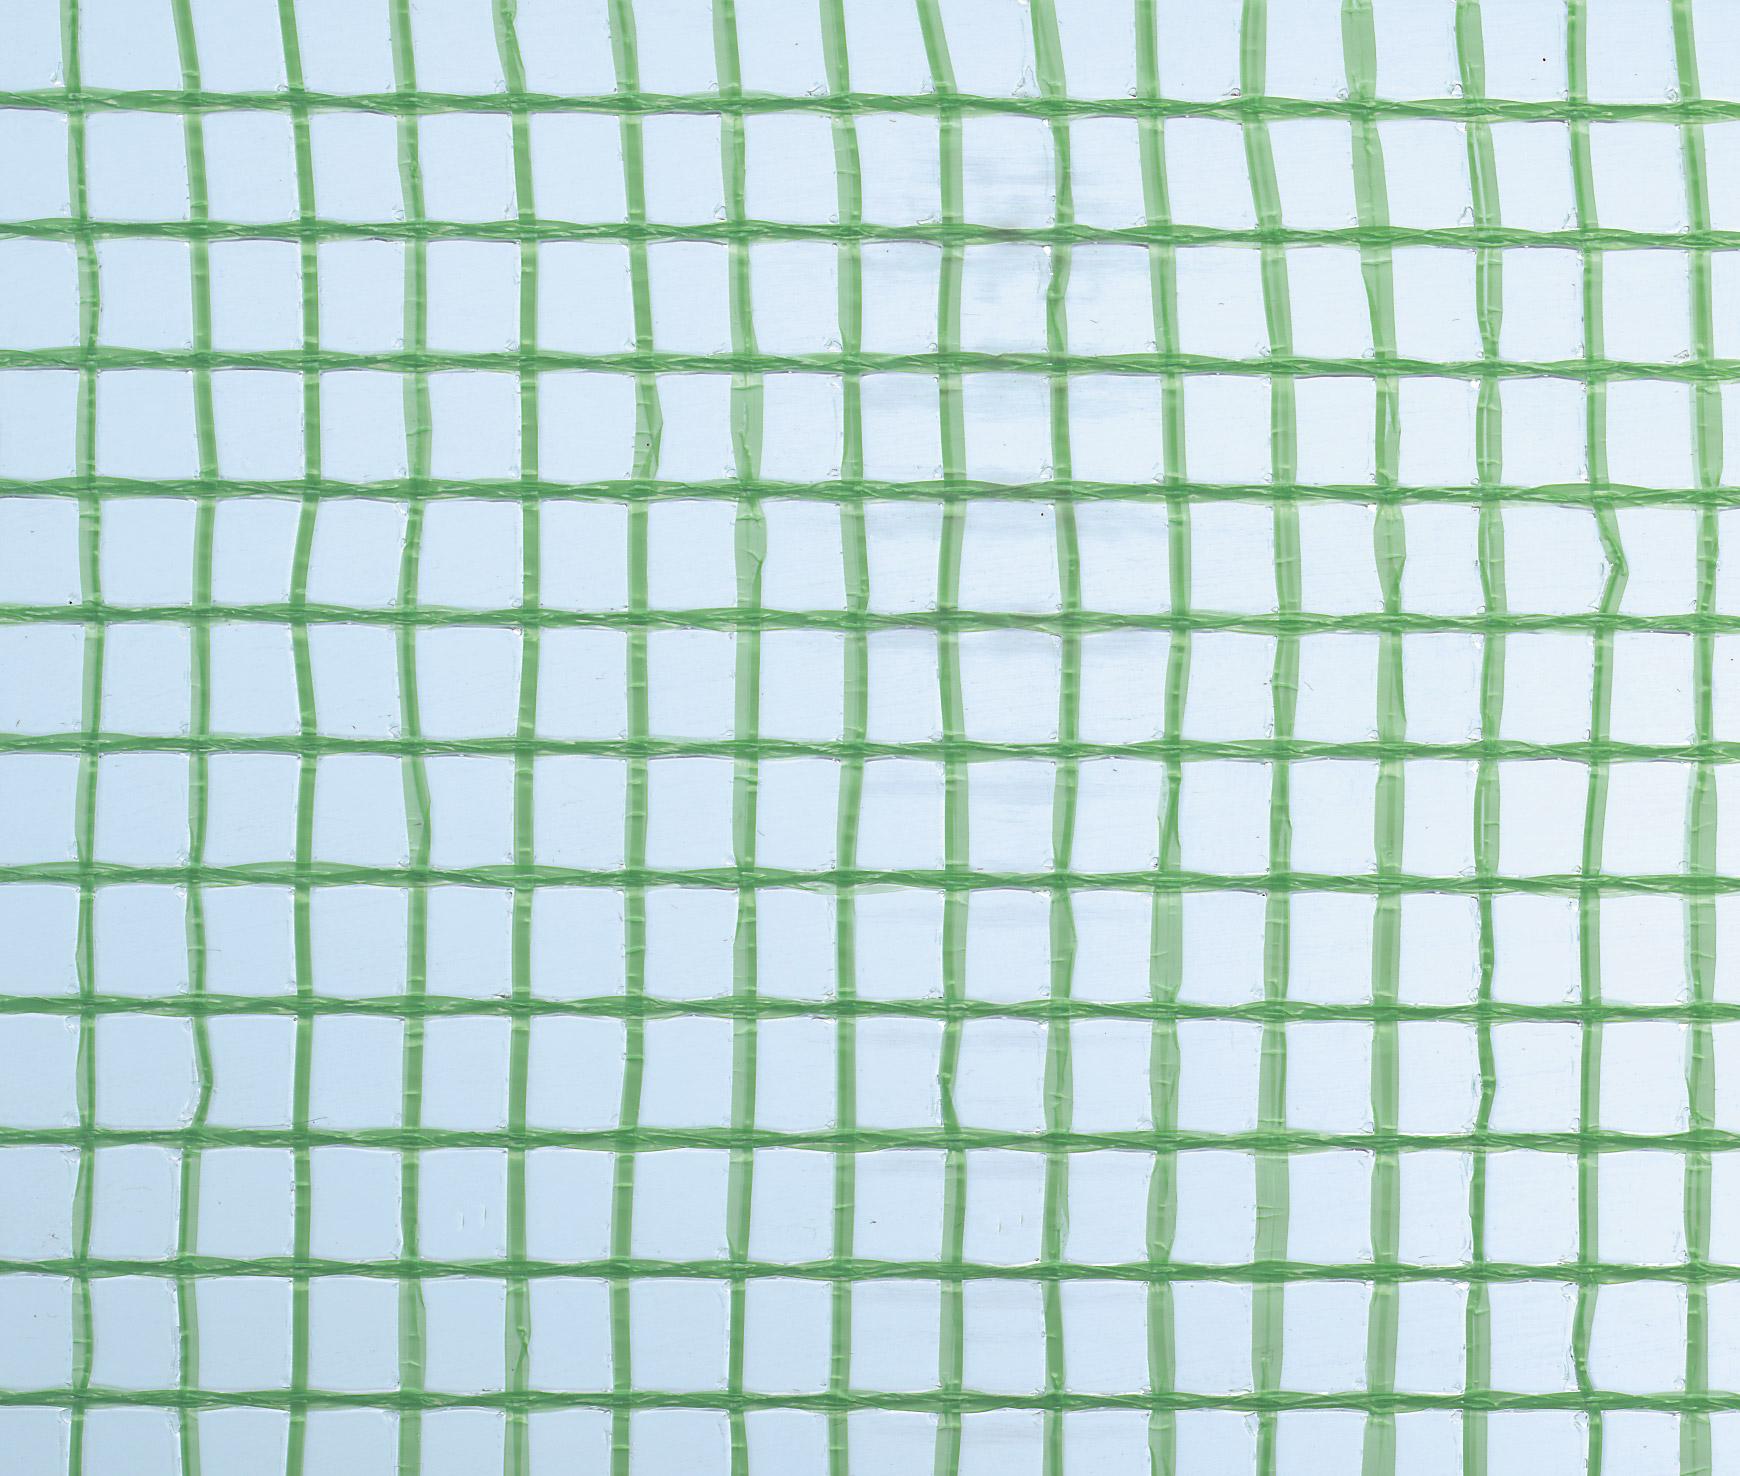 Gitterfolie Standard 1,5 x 50 m Rolle